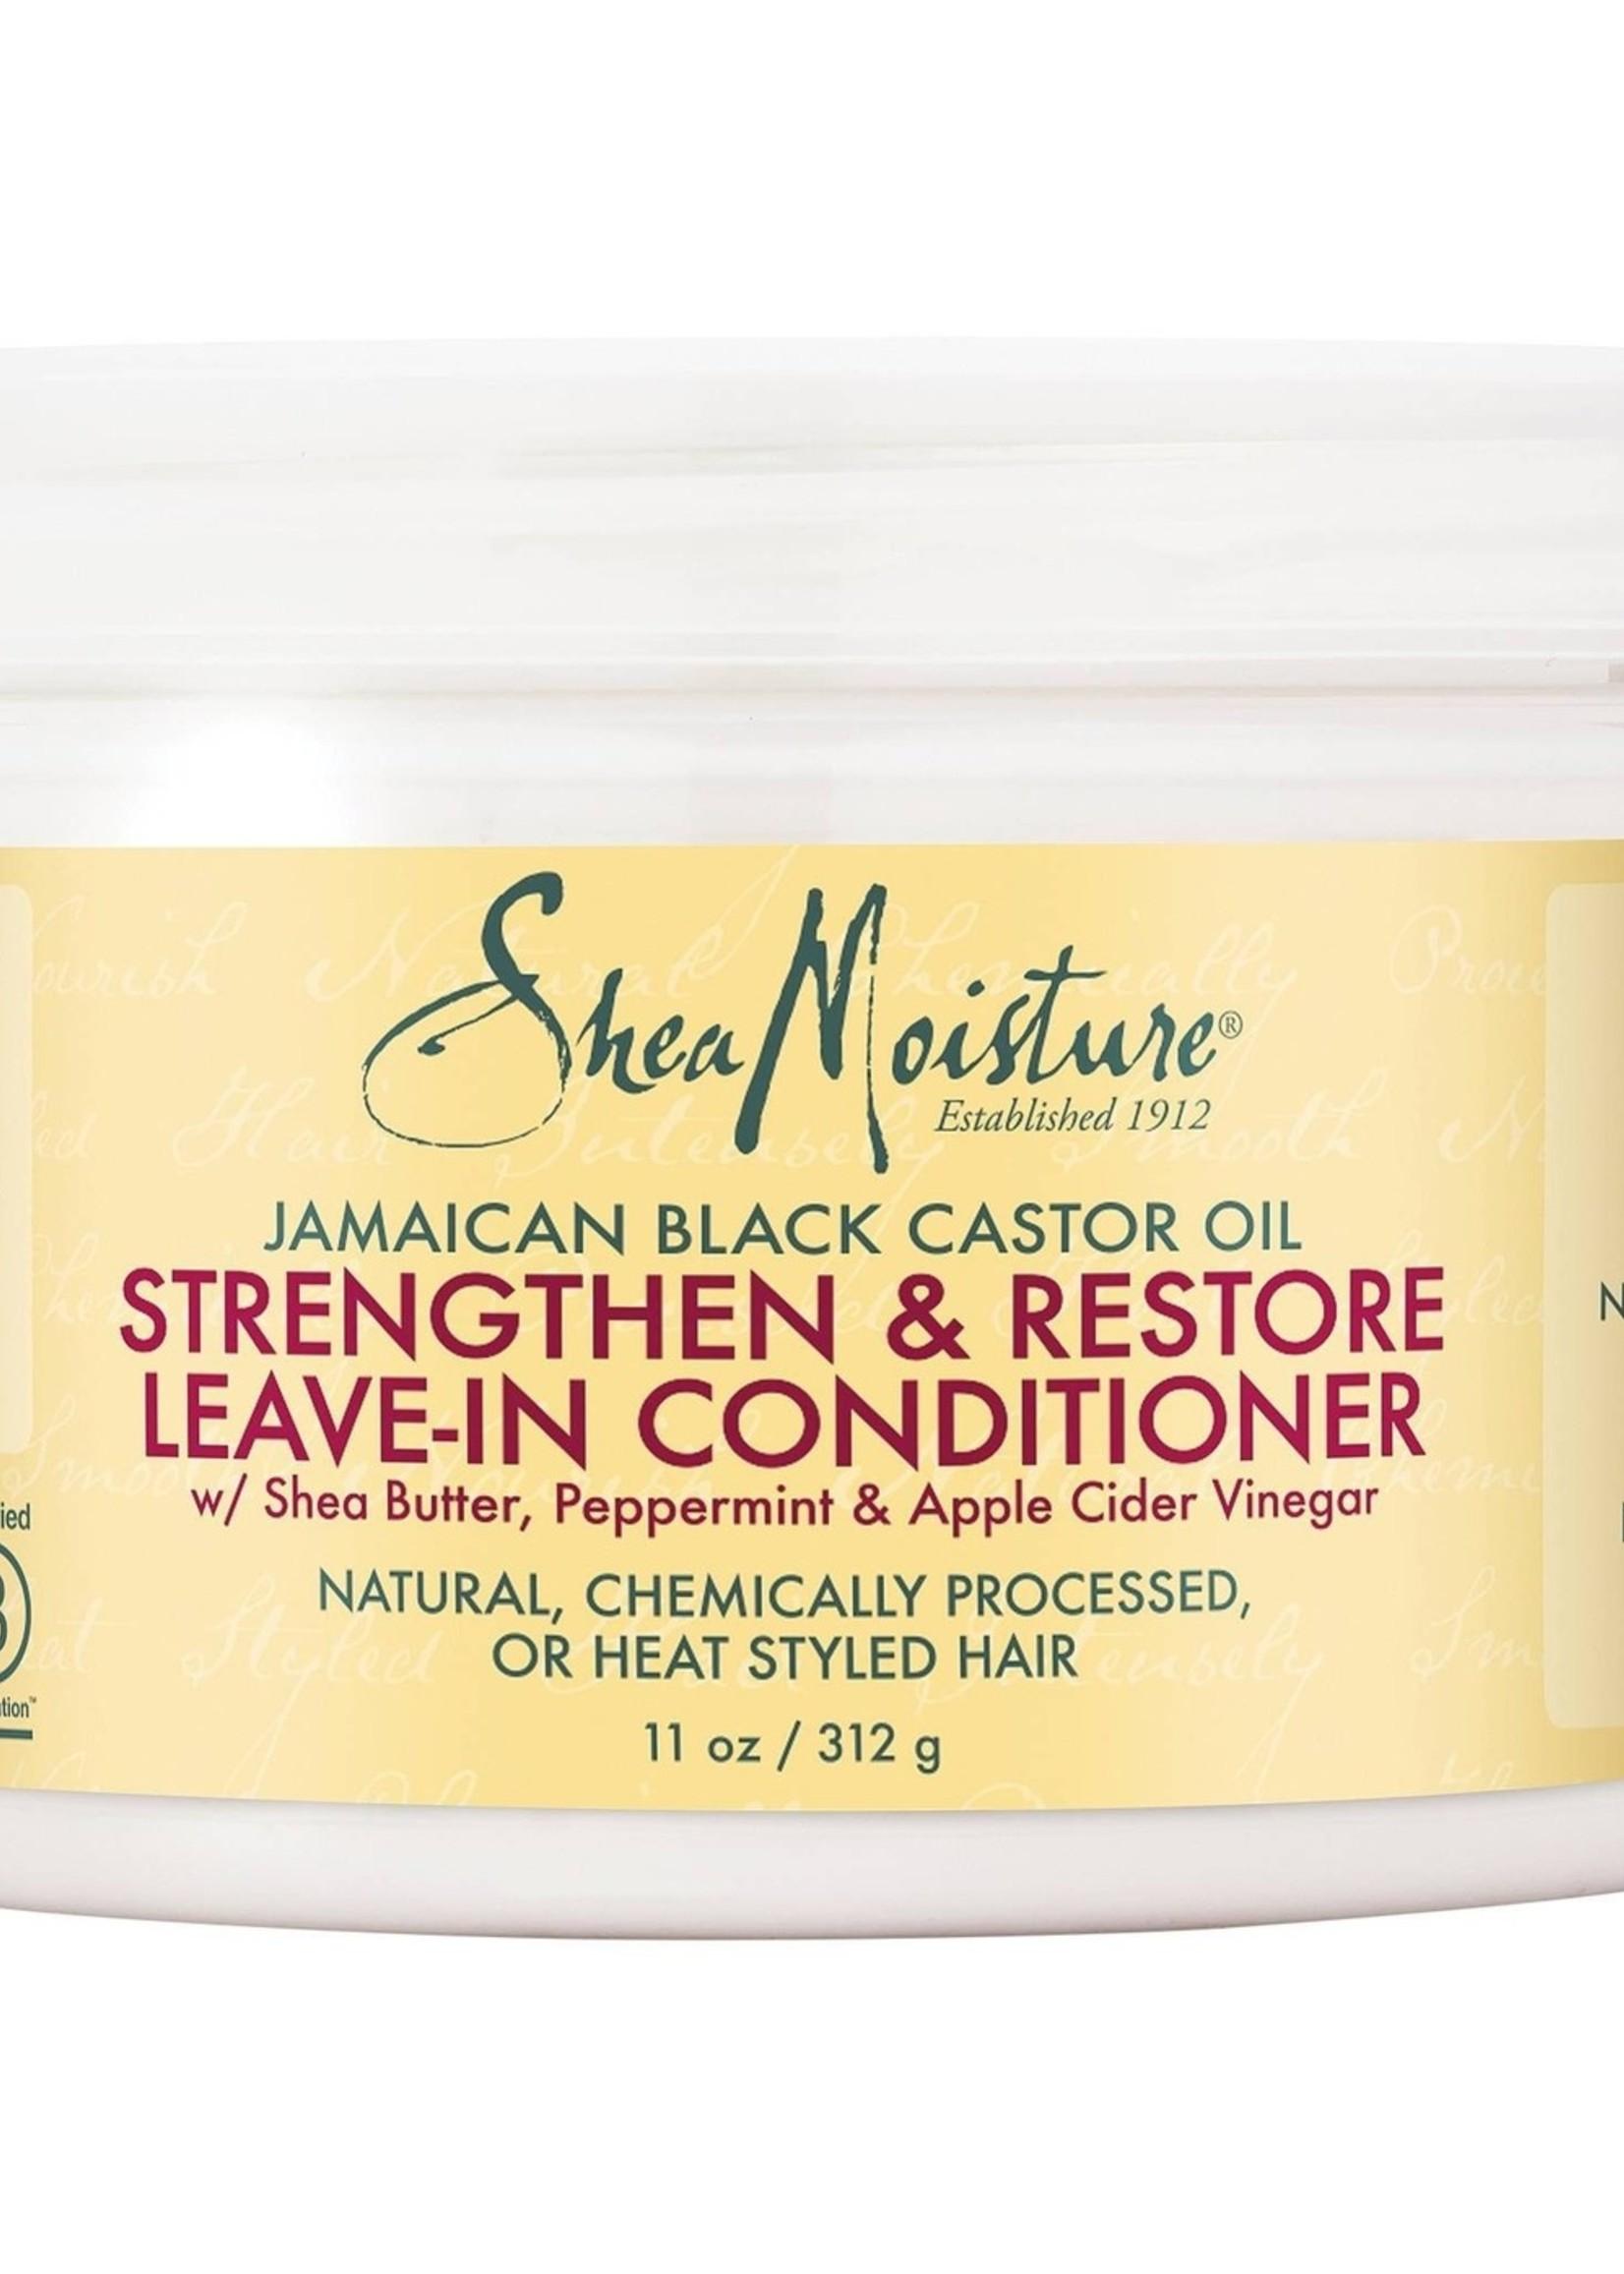 Shea Moisture SHEA MOISTURE - JAMAICAN BLACK CASTOR OIL LEAVE IN CONDITIONER 11 OZ / 312 GR